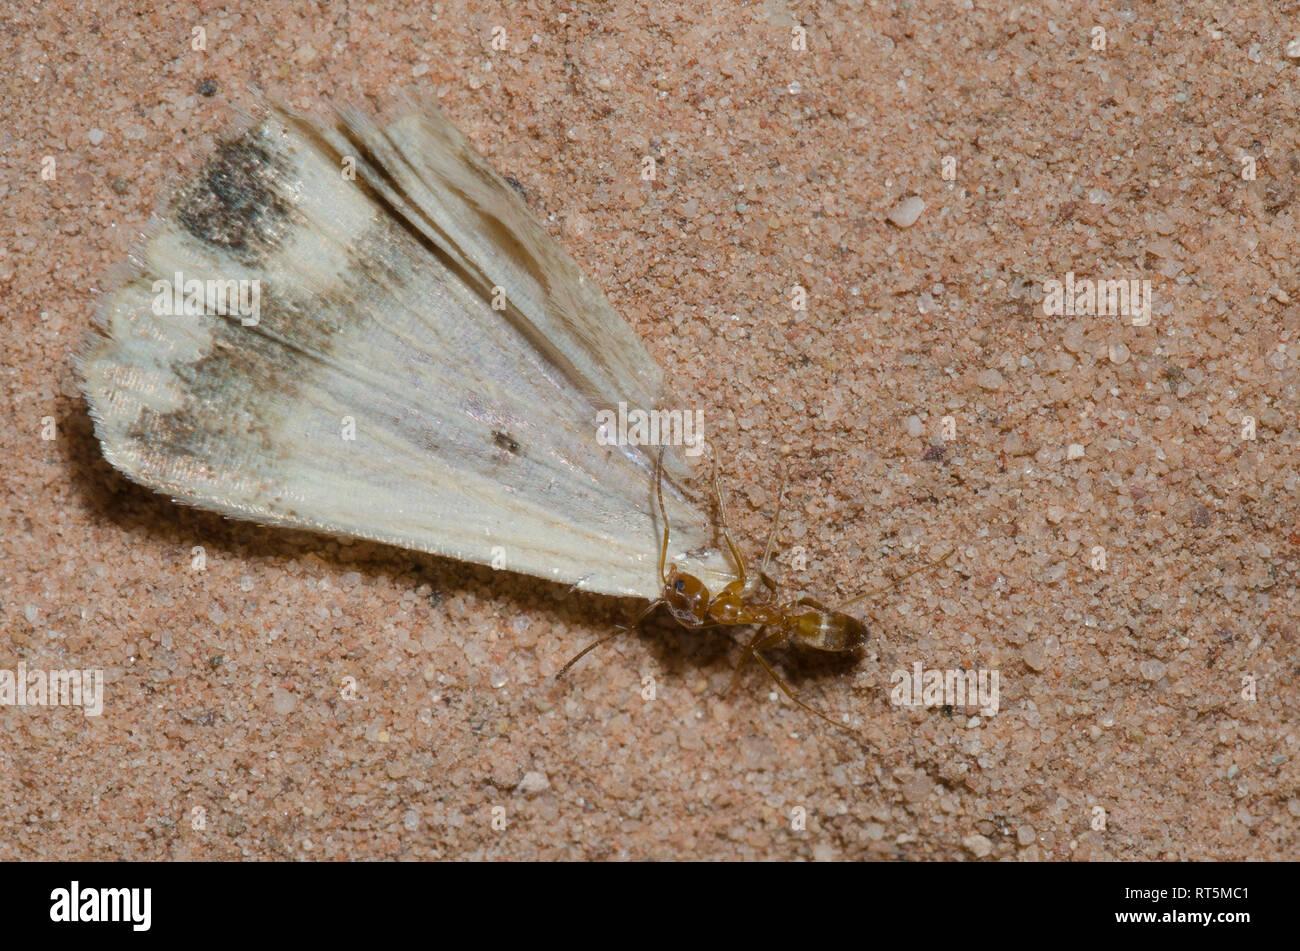 Pyramid Ant, Dorymyrmex flavus, hauling moth wing - Stock Image